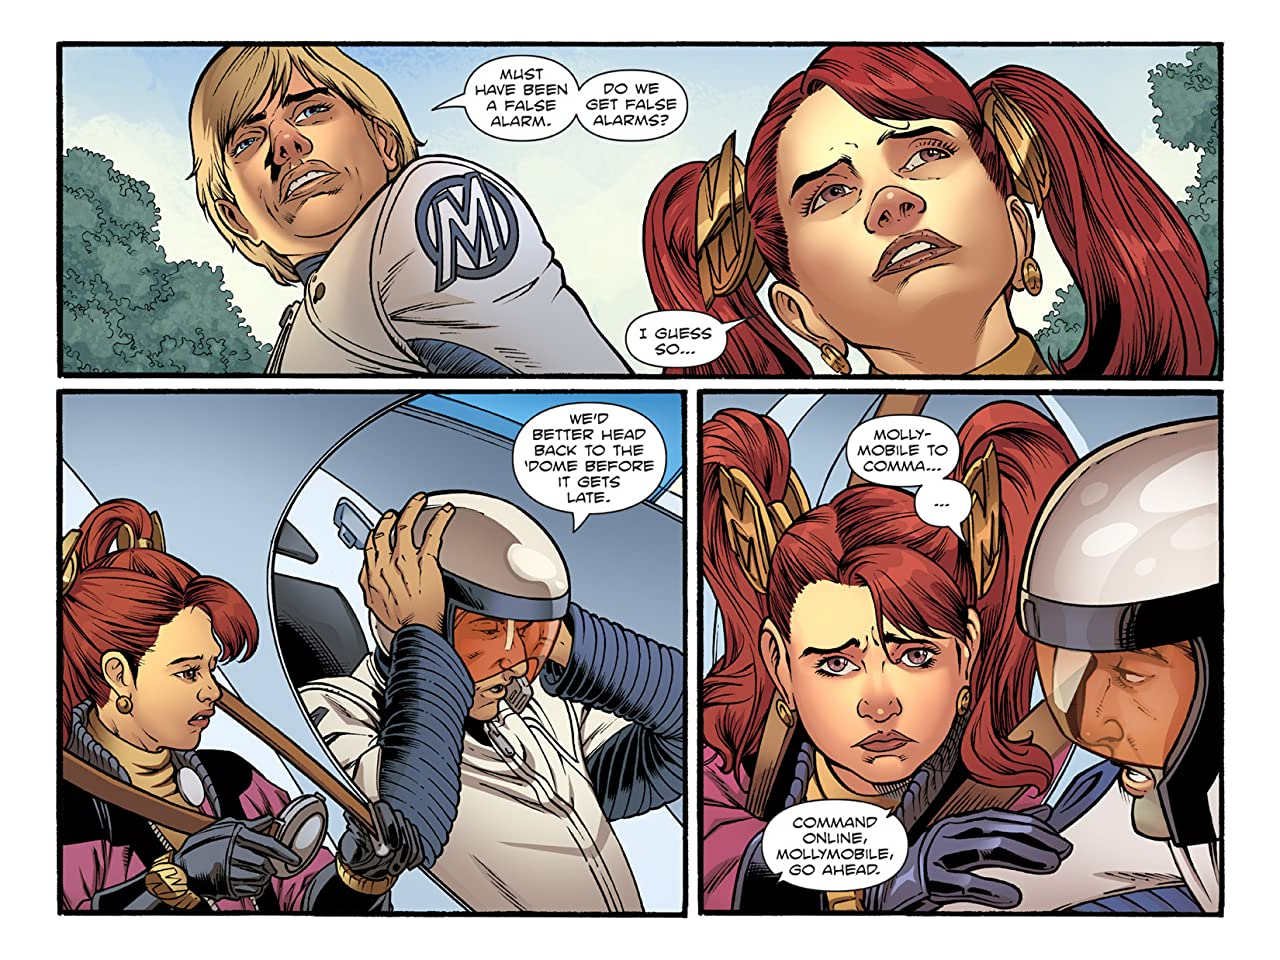 Molly Danger: Digital #4